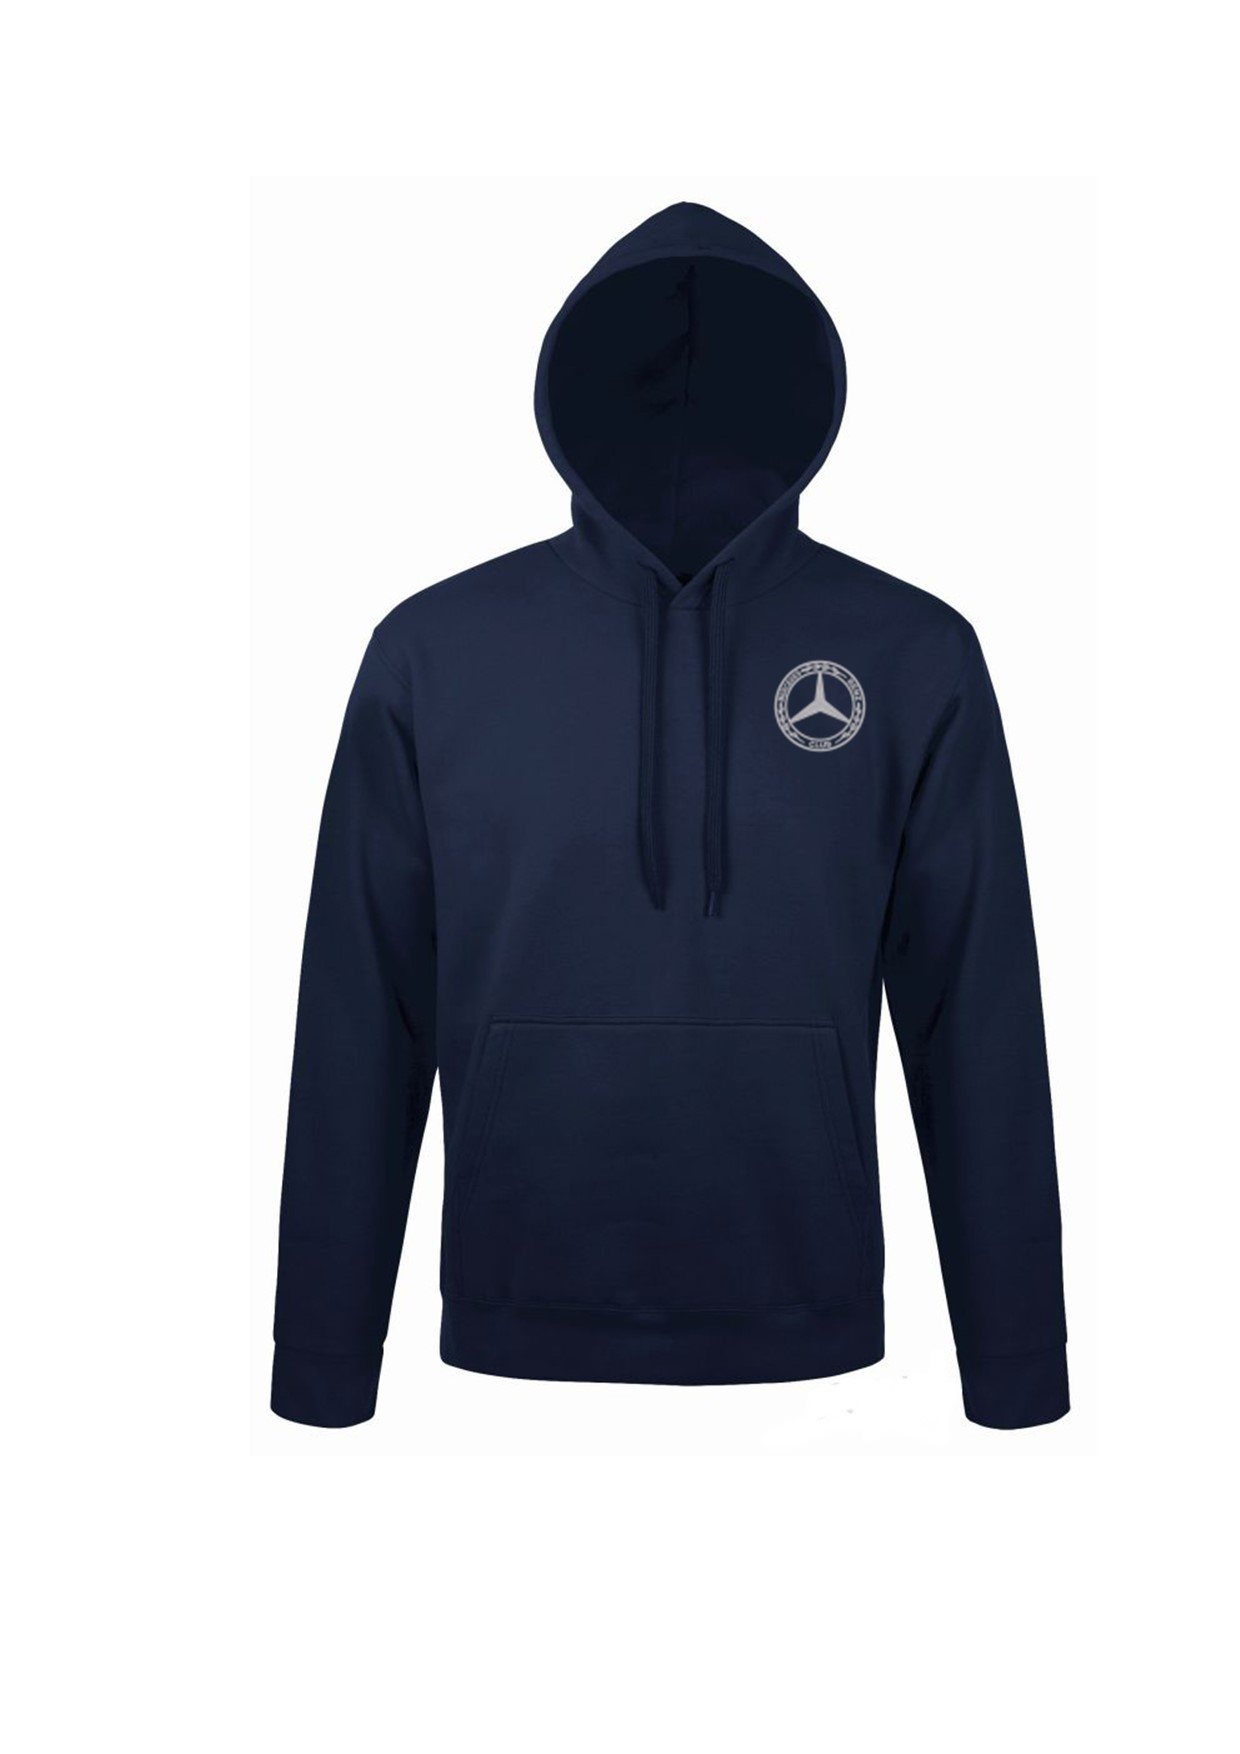 Mercedes-Benz Club Unisex Hooded Sweatshirt French Navy